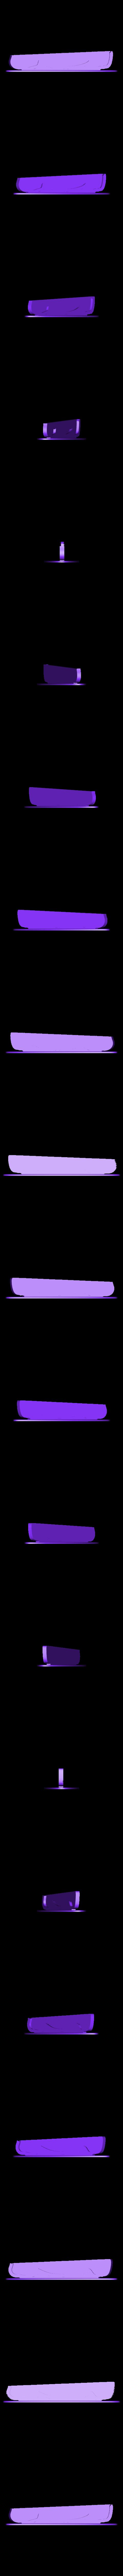 Stand_01.stl Download free STL file Mr. Natural -  R Crumb • 3D printer object, JayOmega